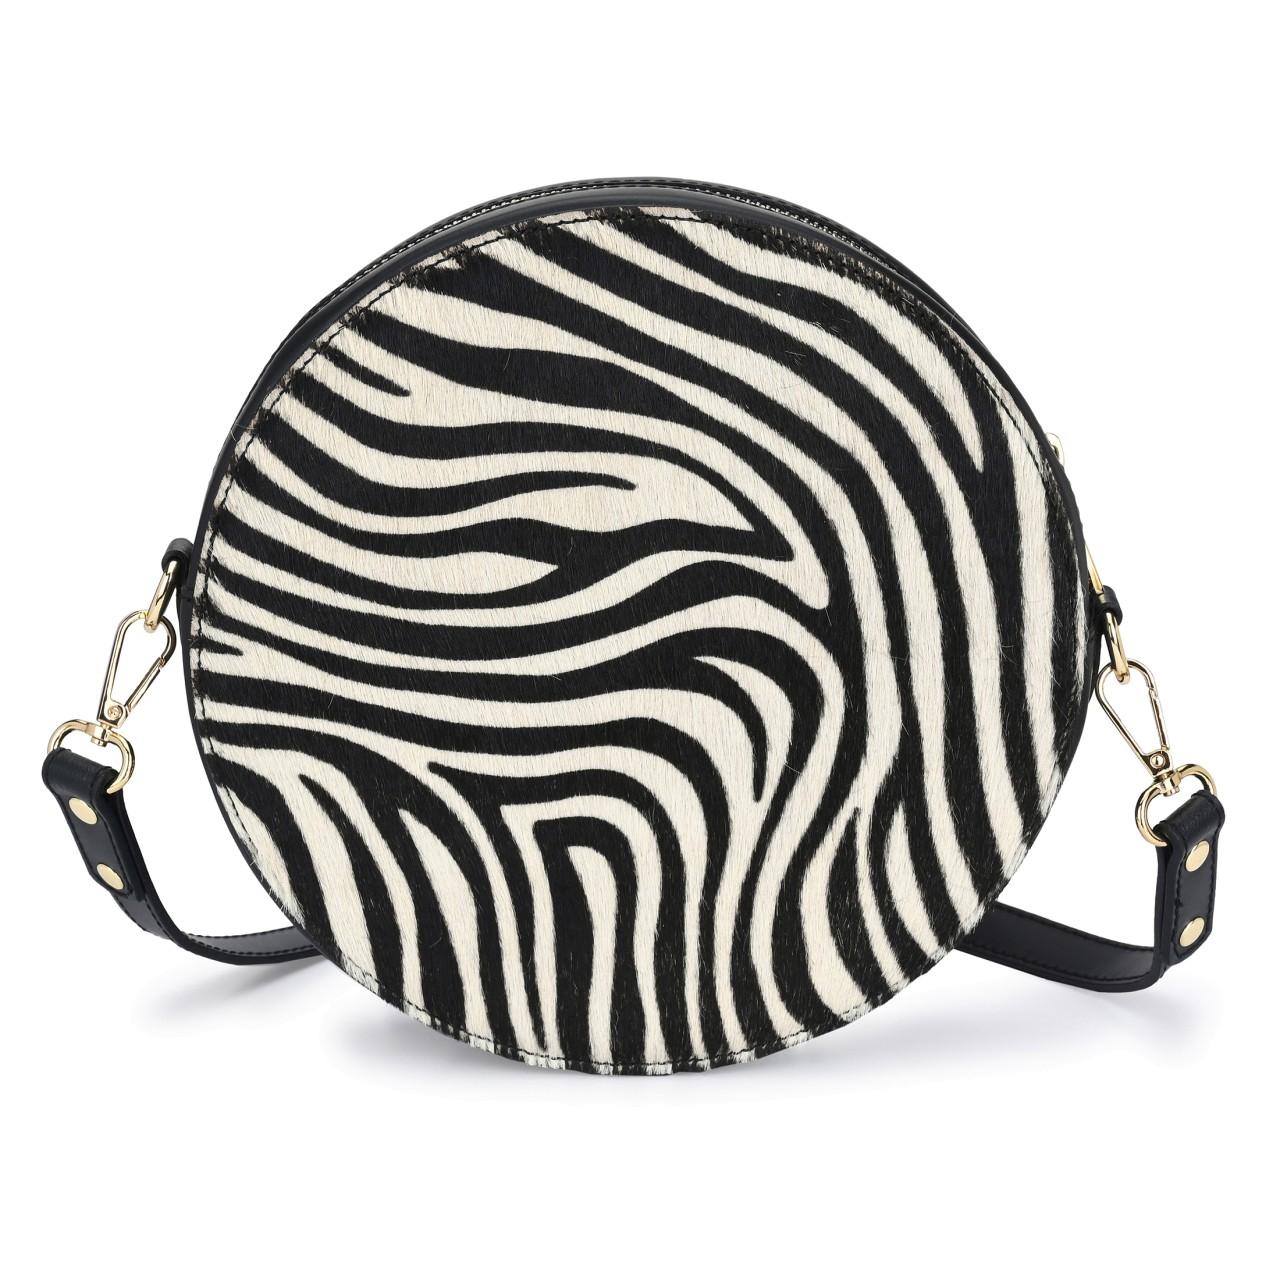 CAPRI Schwarz mit Fell Zebra